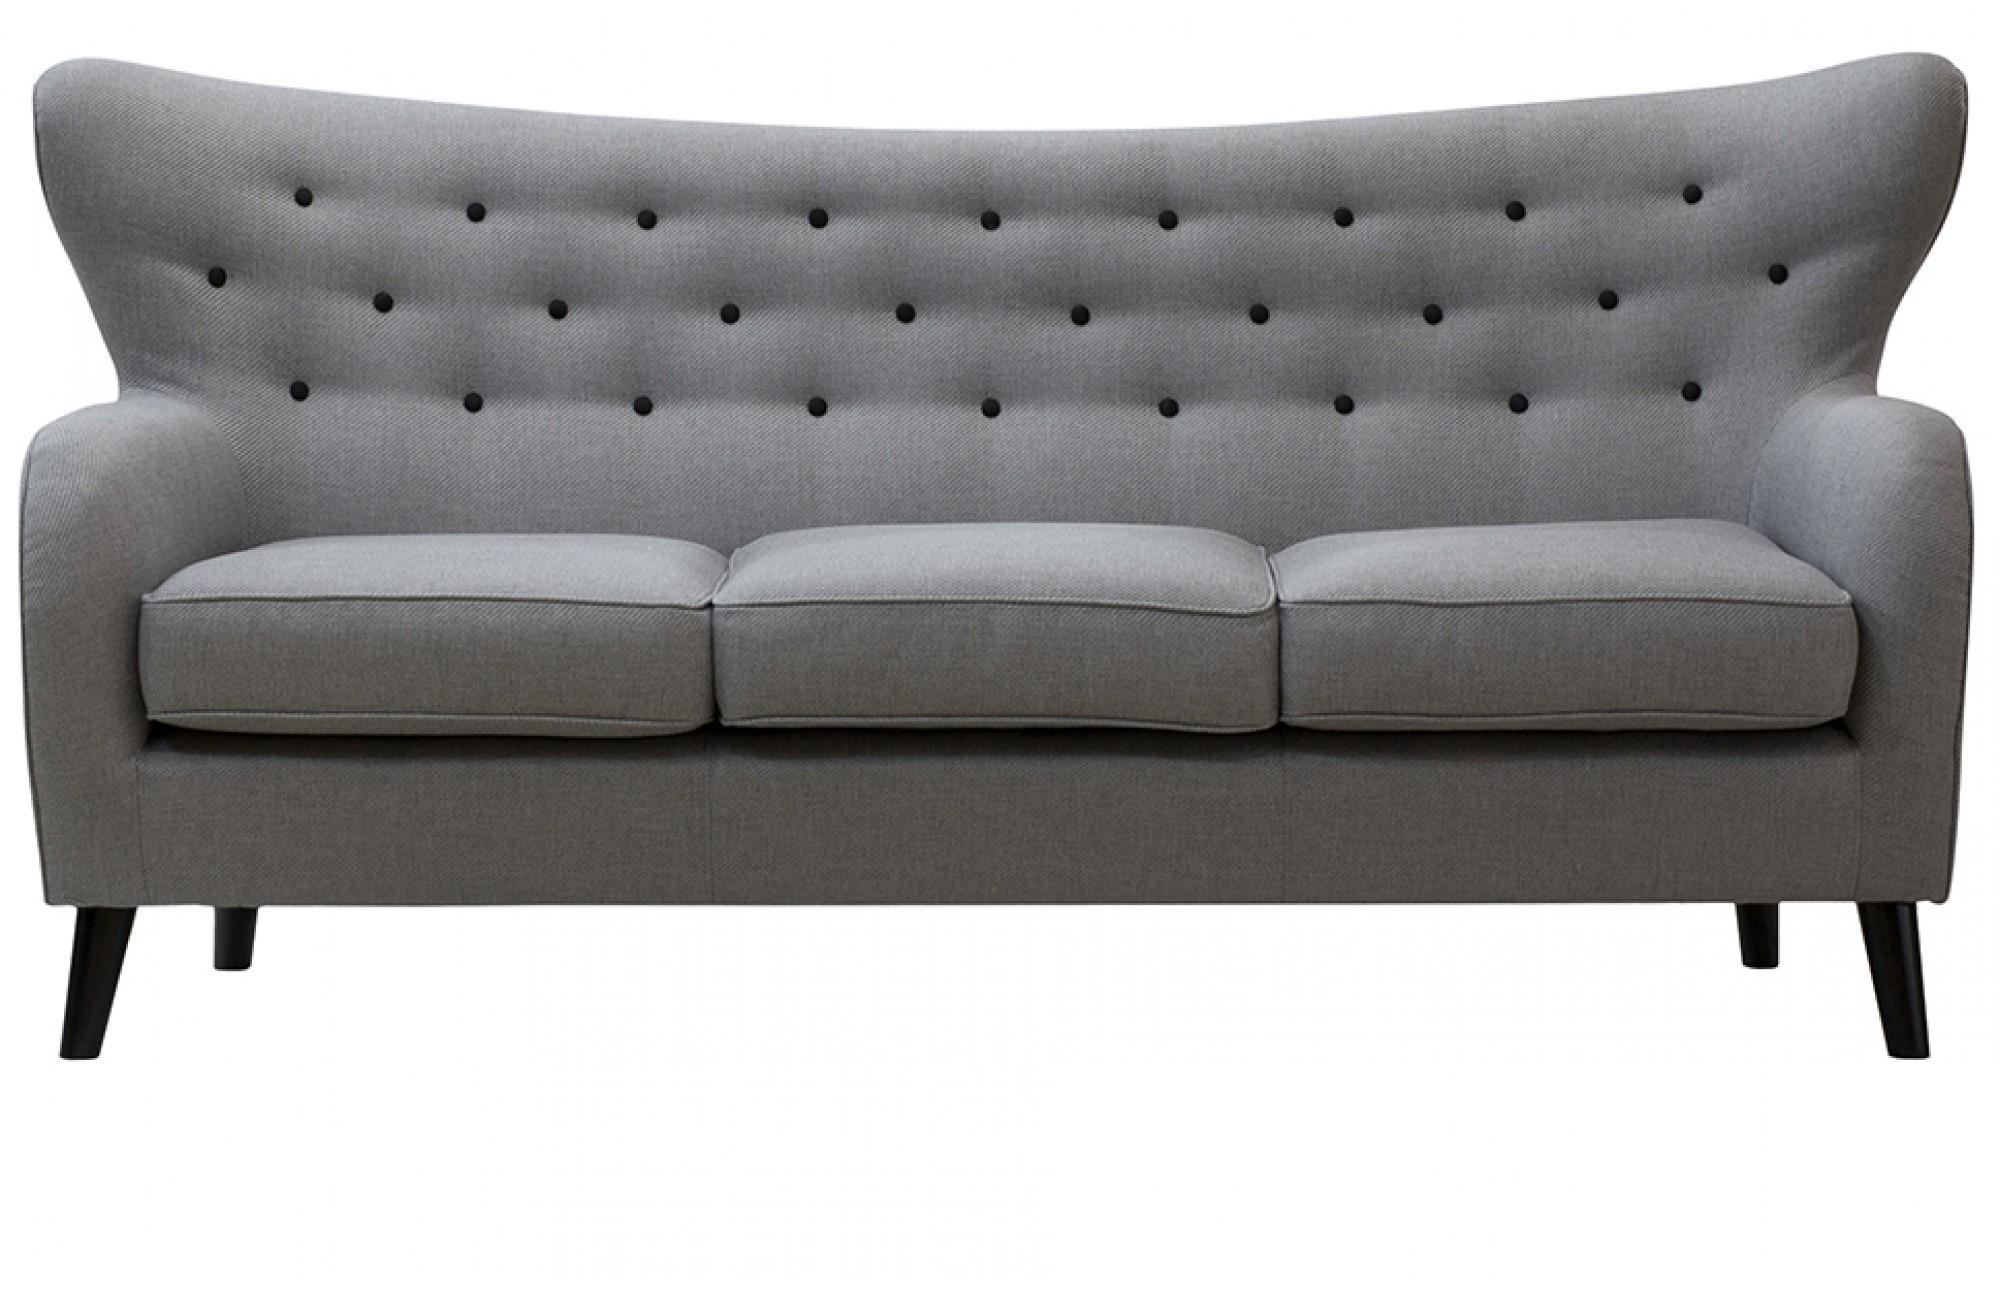 3 seater sofa photos boconcept zen sleeper 20 best ideas three sofas